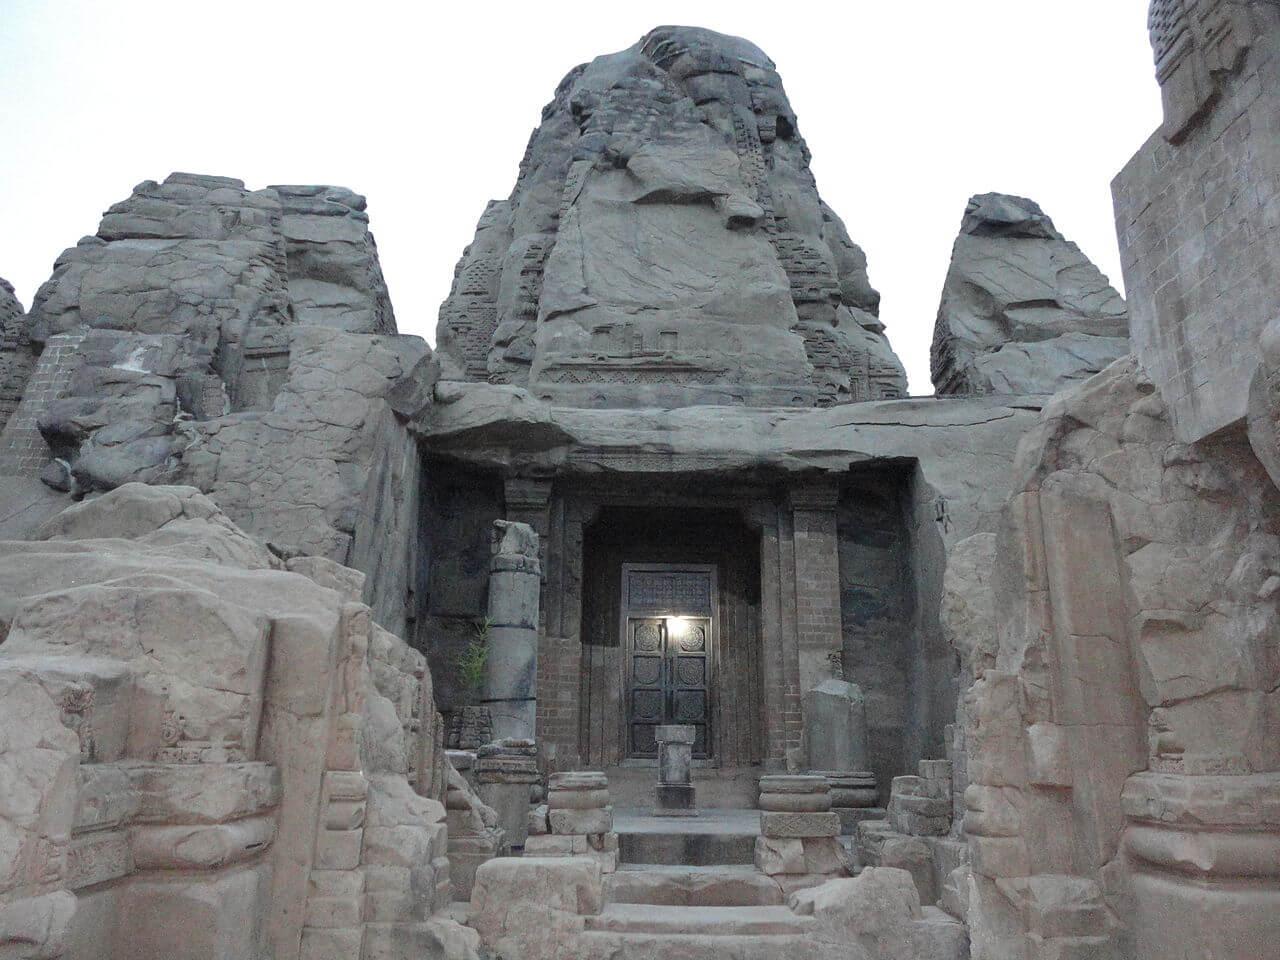 Colganj rock cut temple real image